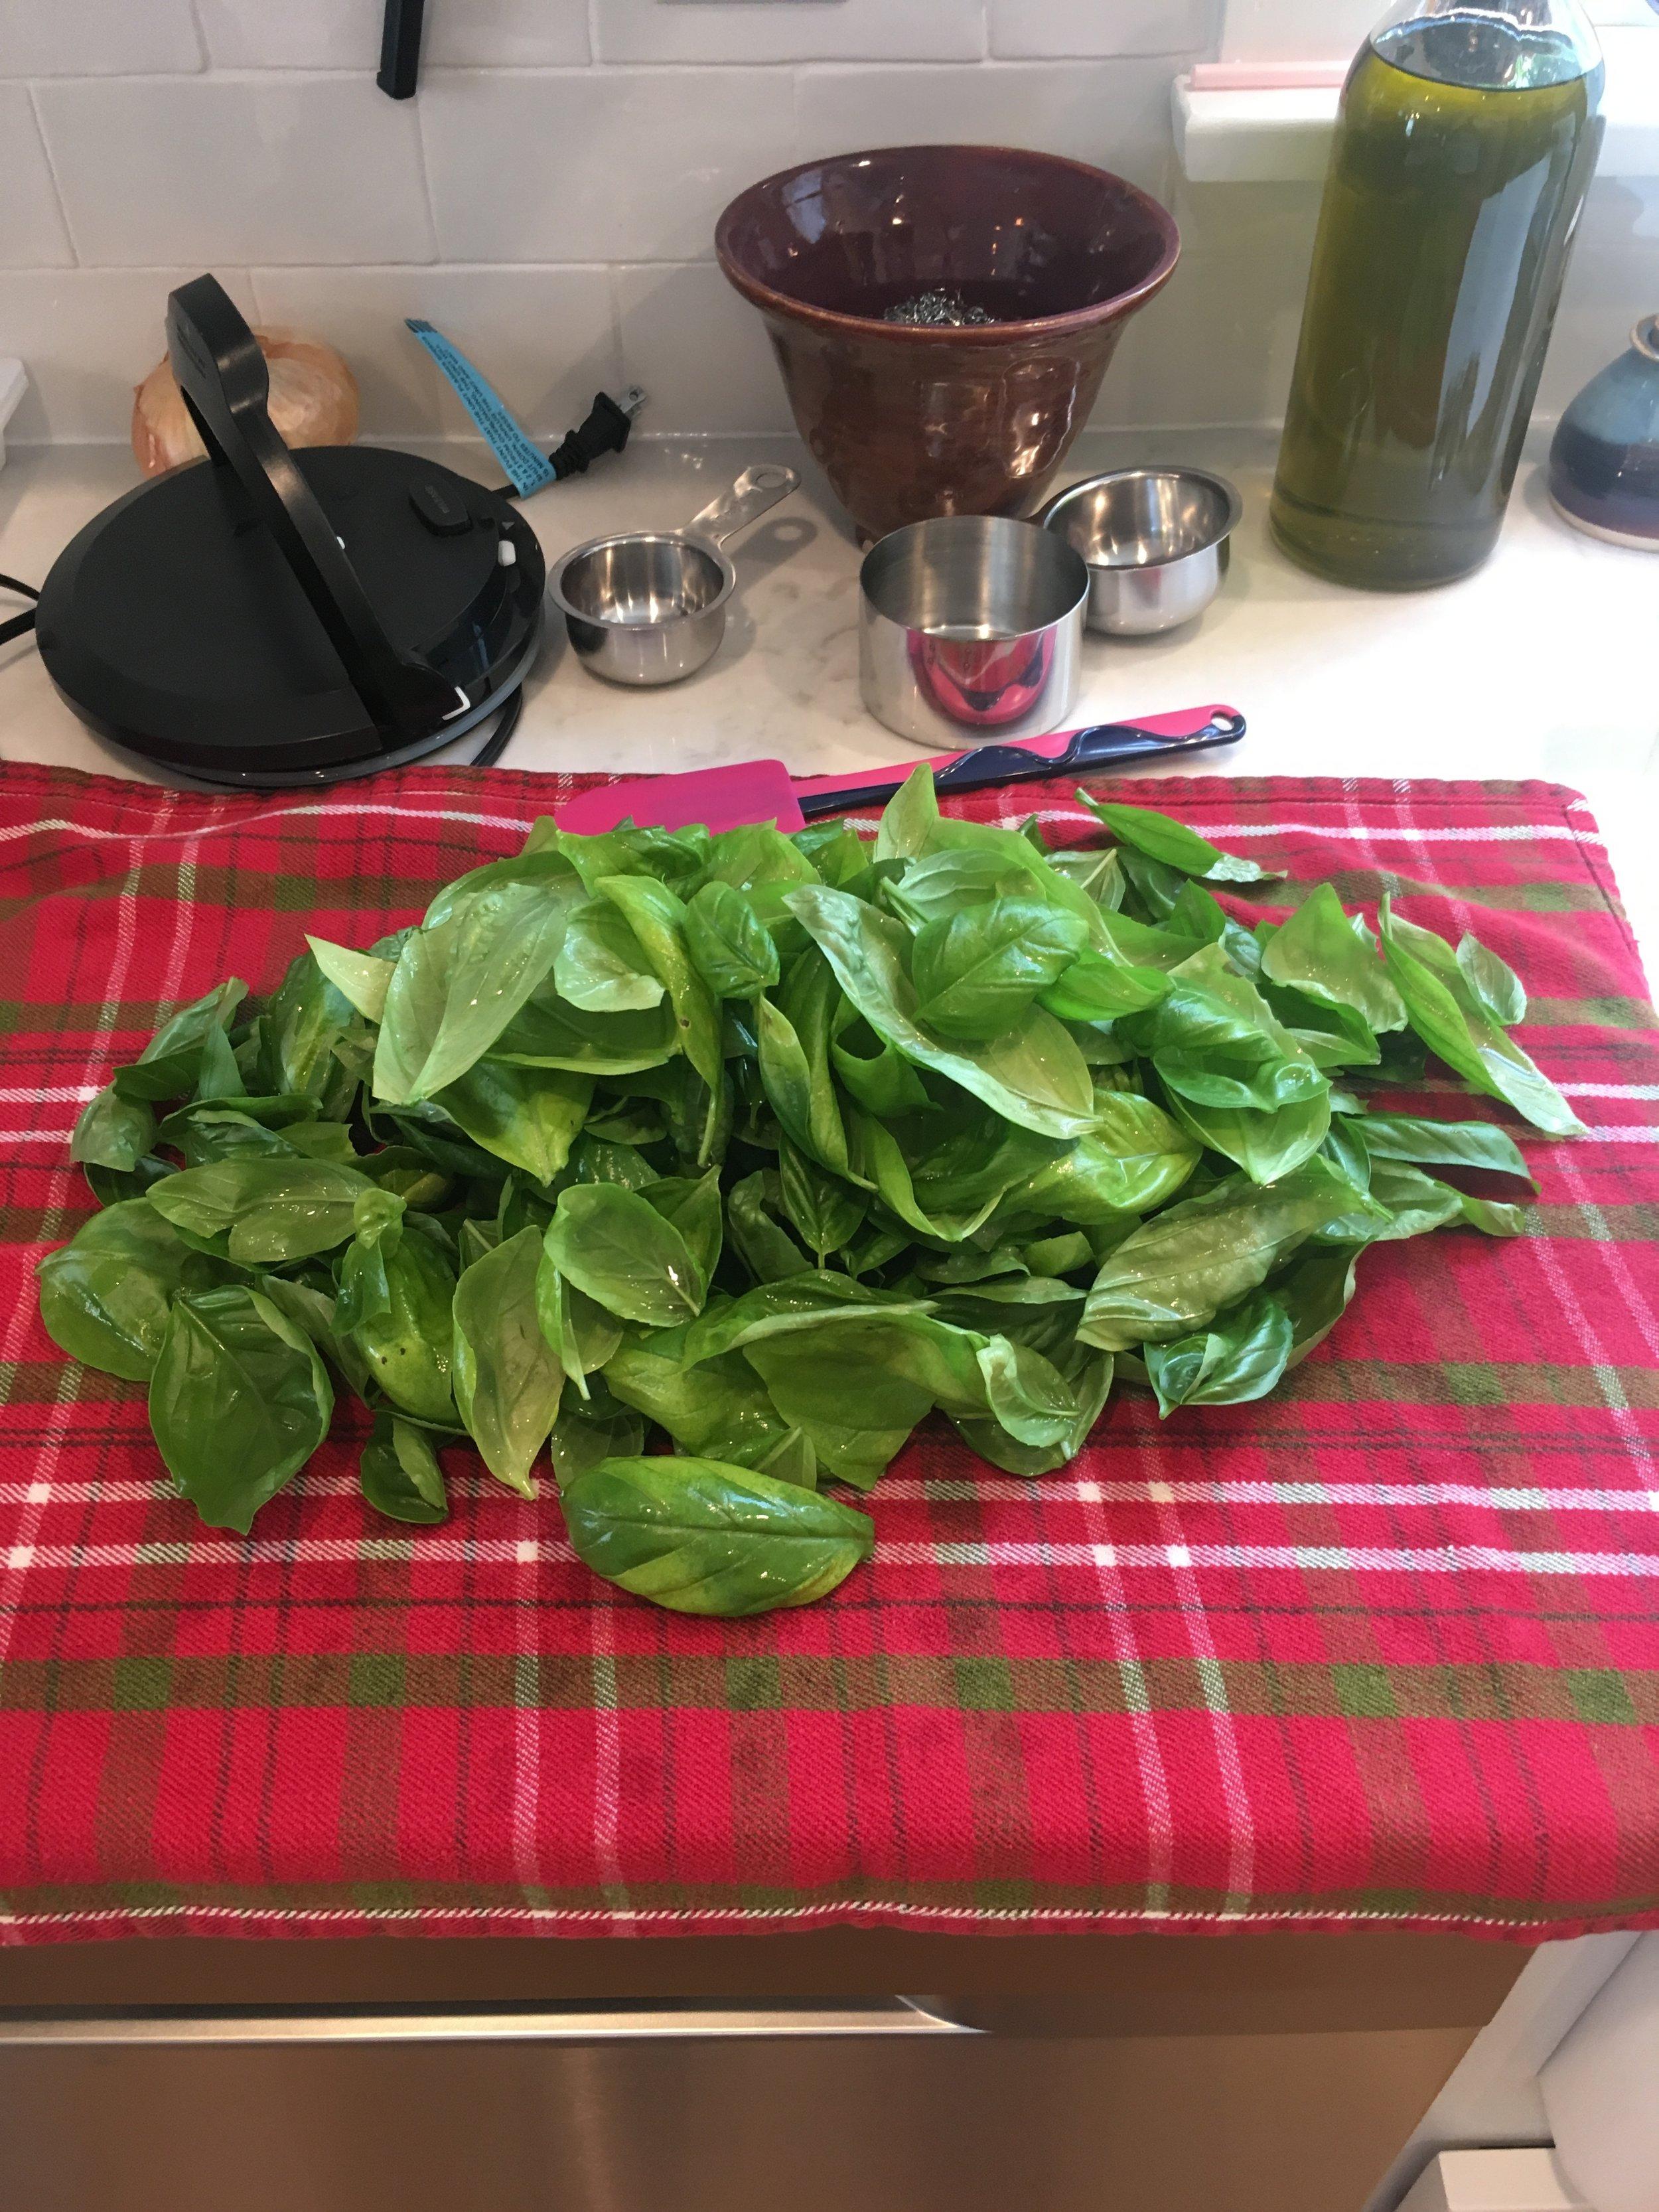 2 Washed Basil Leaves.JPG